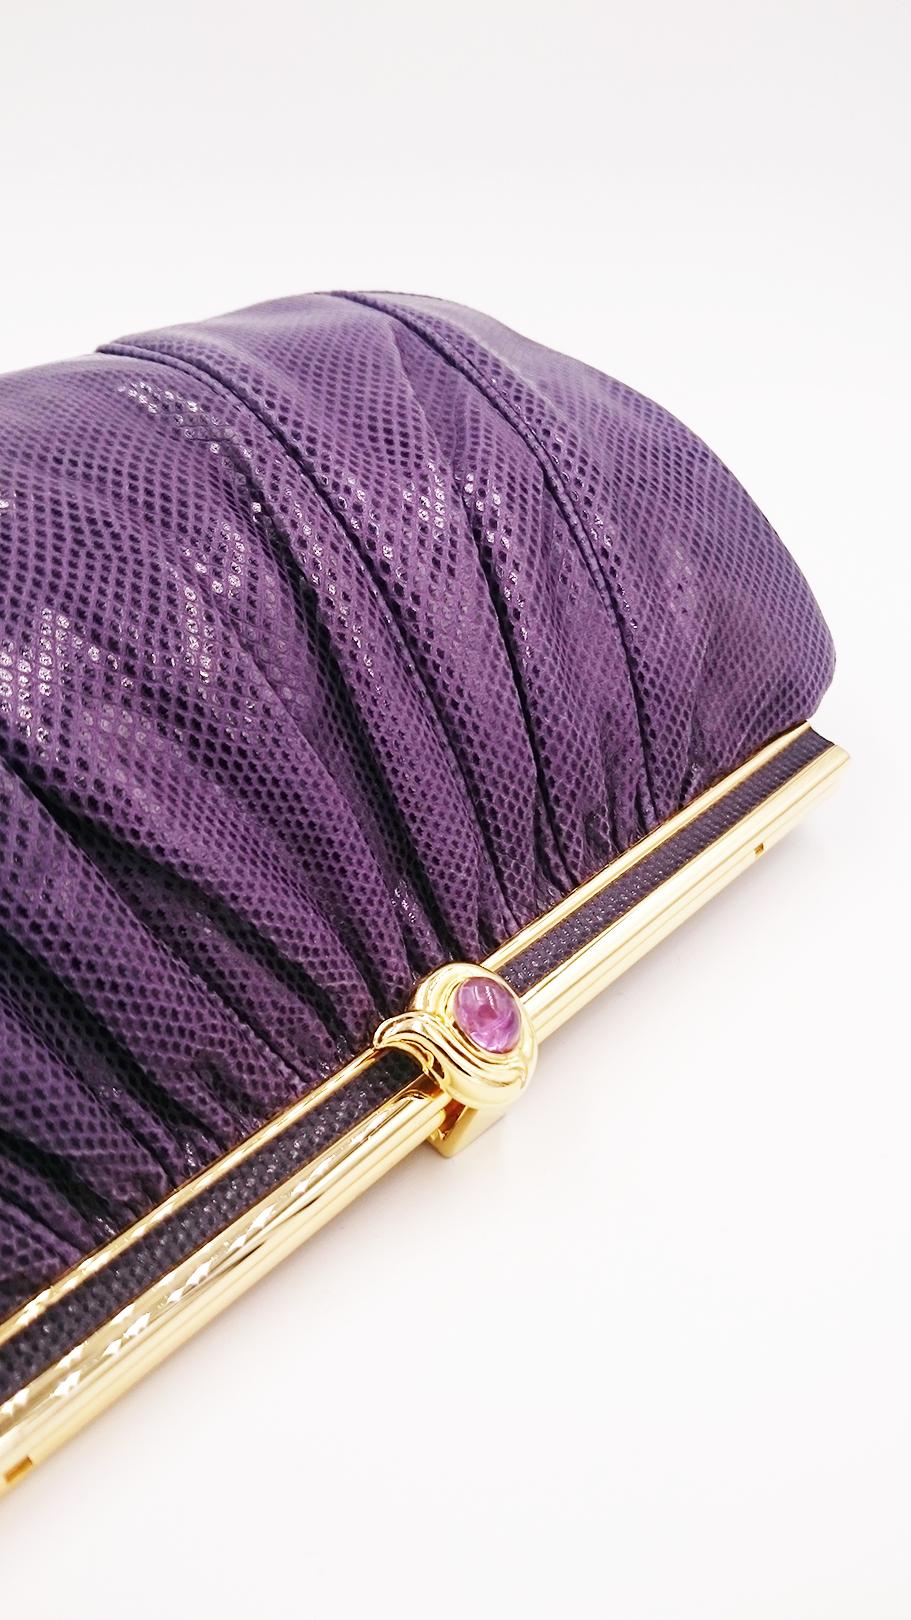 Purple Leiber bag